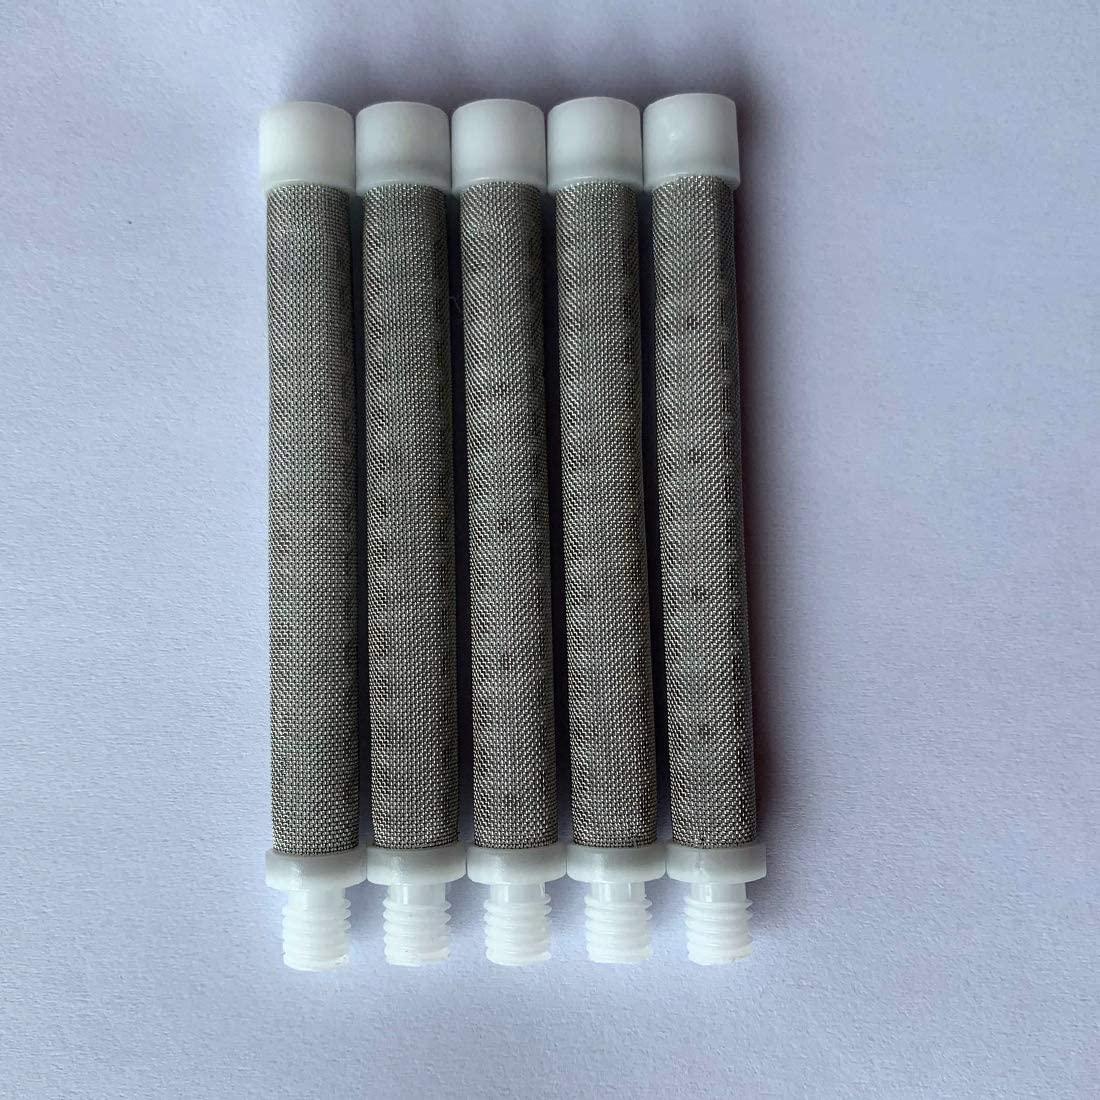 Titan Airless Spray Gun Filter 500-200-06 for Titan LX80II, Titan LX80, 60 Mesh White. 5PACKS